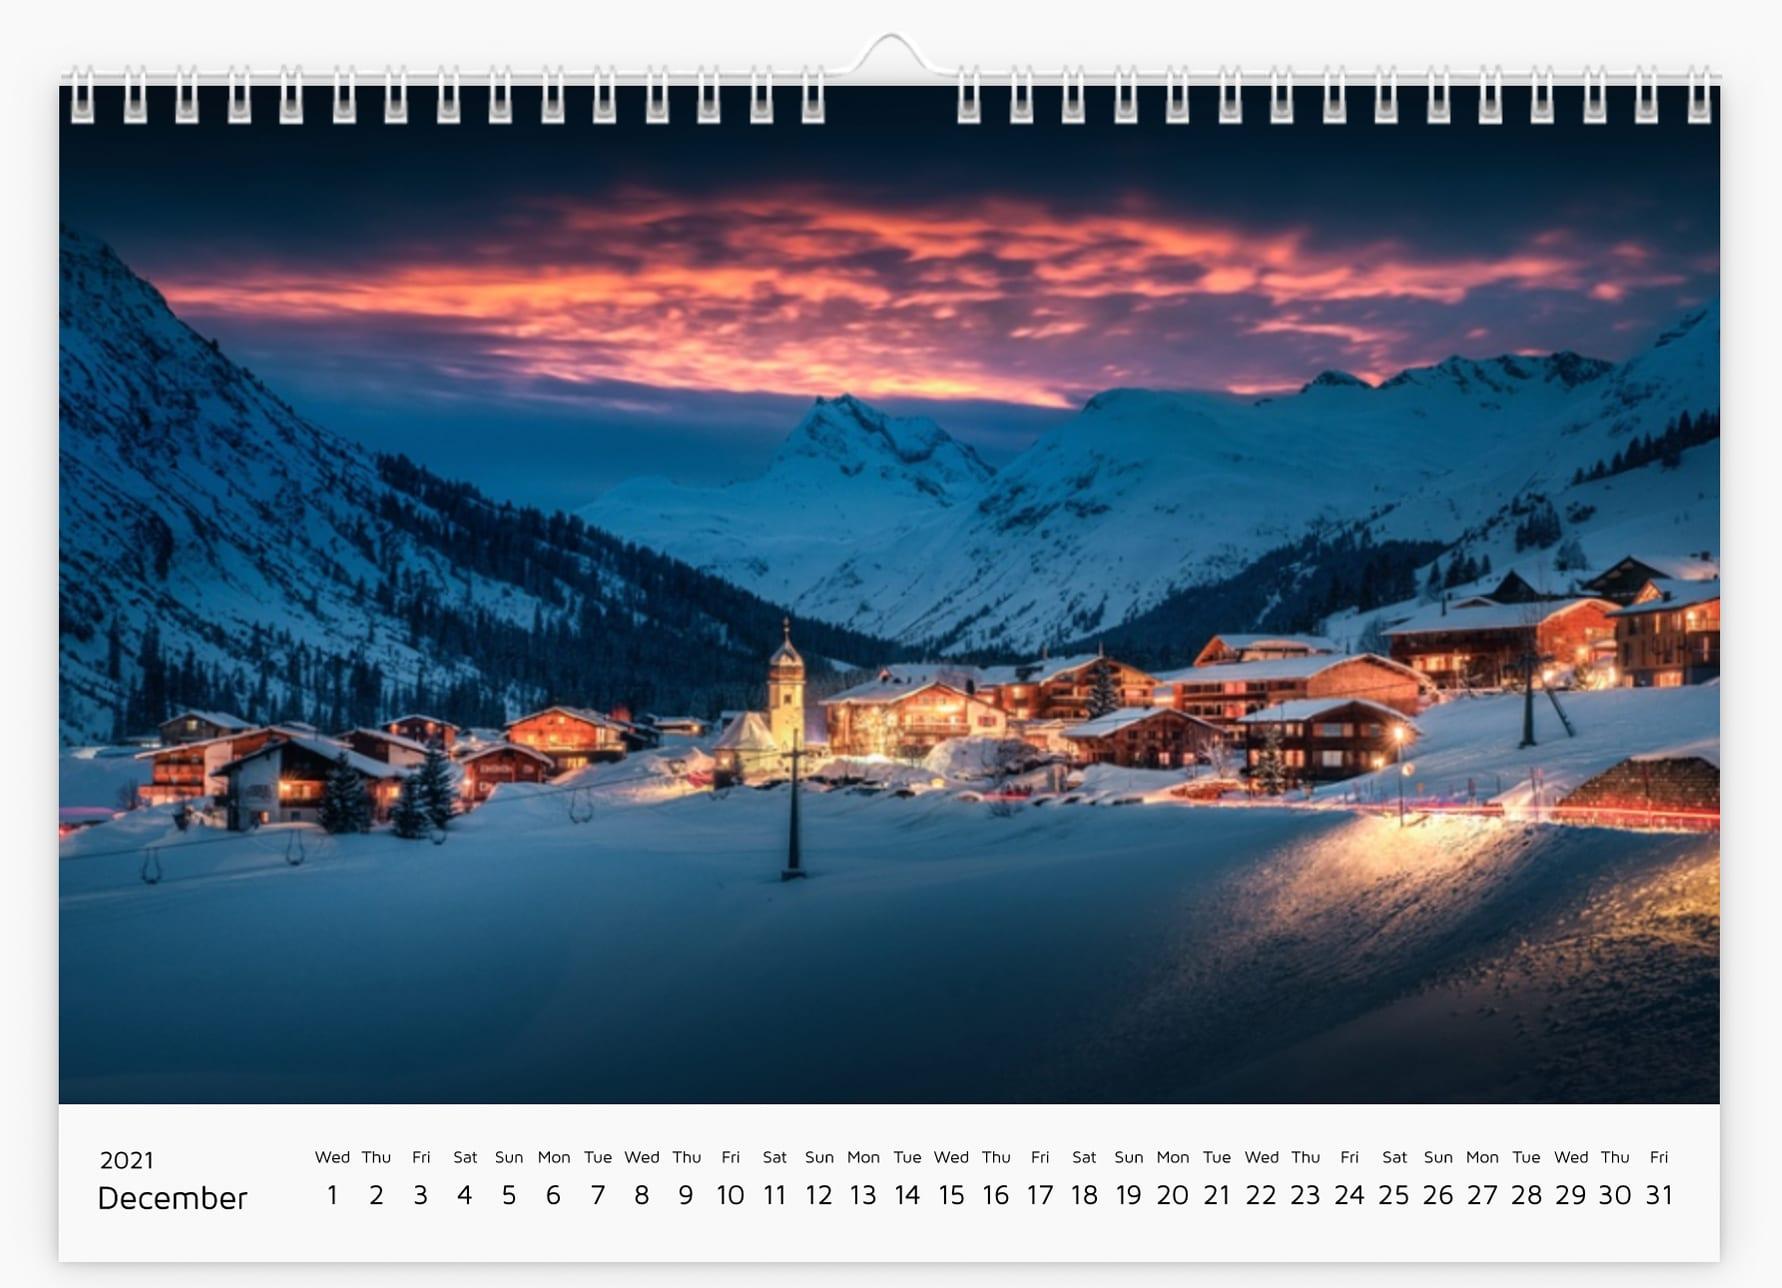 December - Calendar 2021